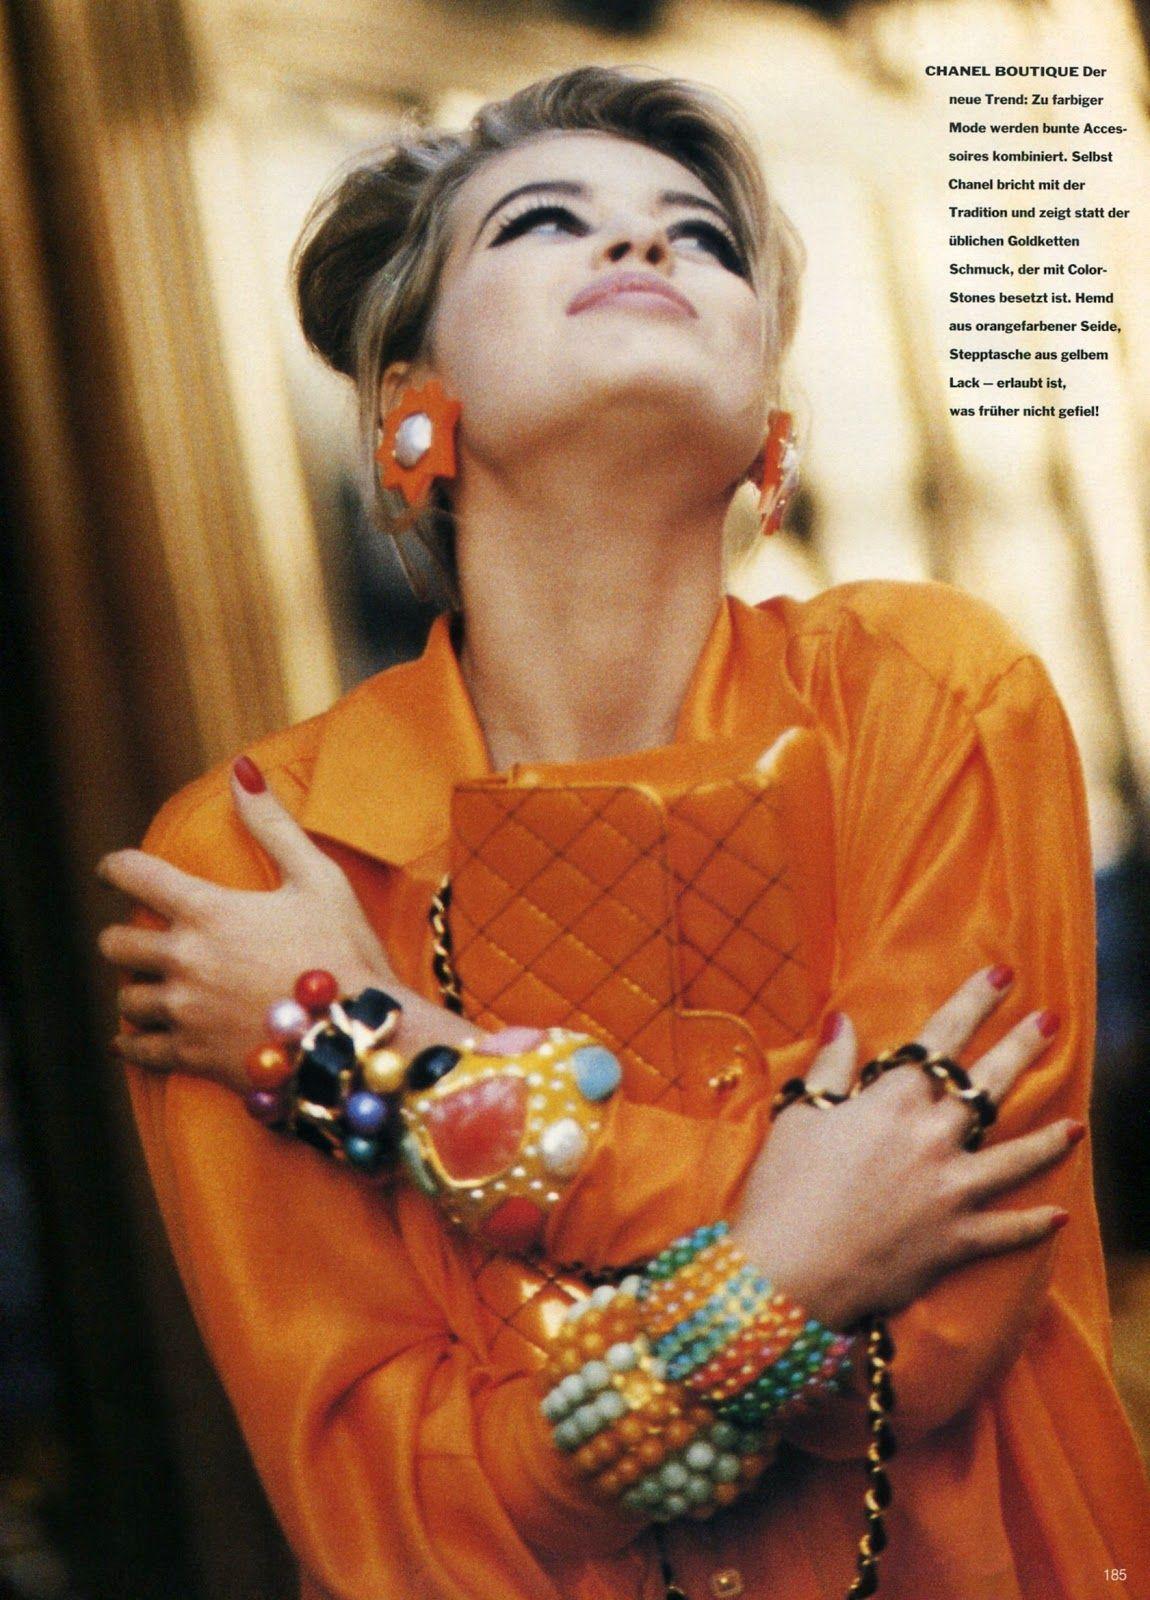 Vogue (Germany) January 1991 | Sommer-News 04.jpg